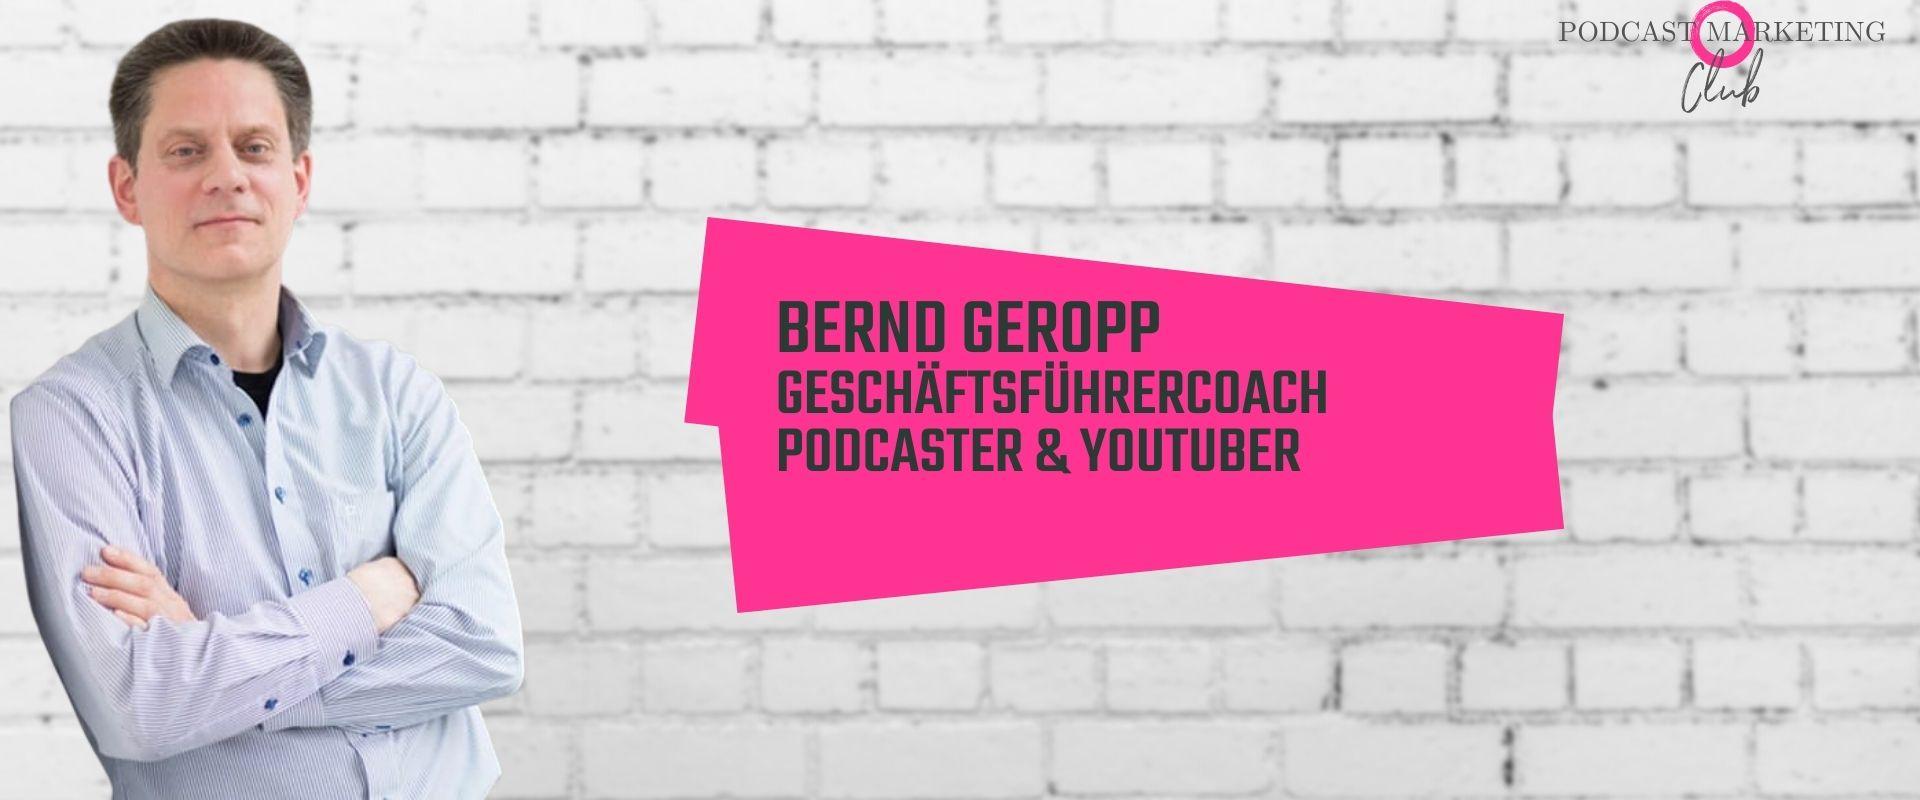 Bernd Geropp Podcast Youtube 104